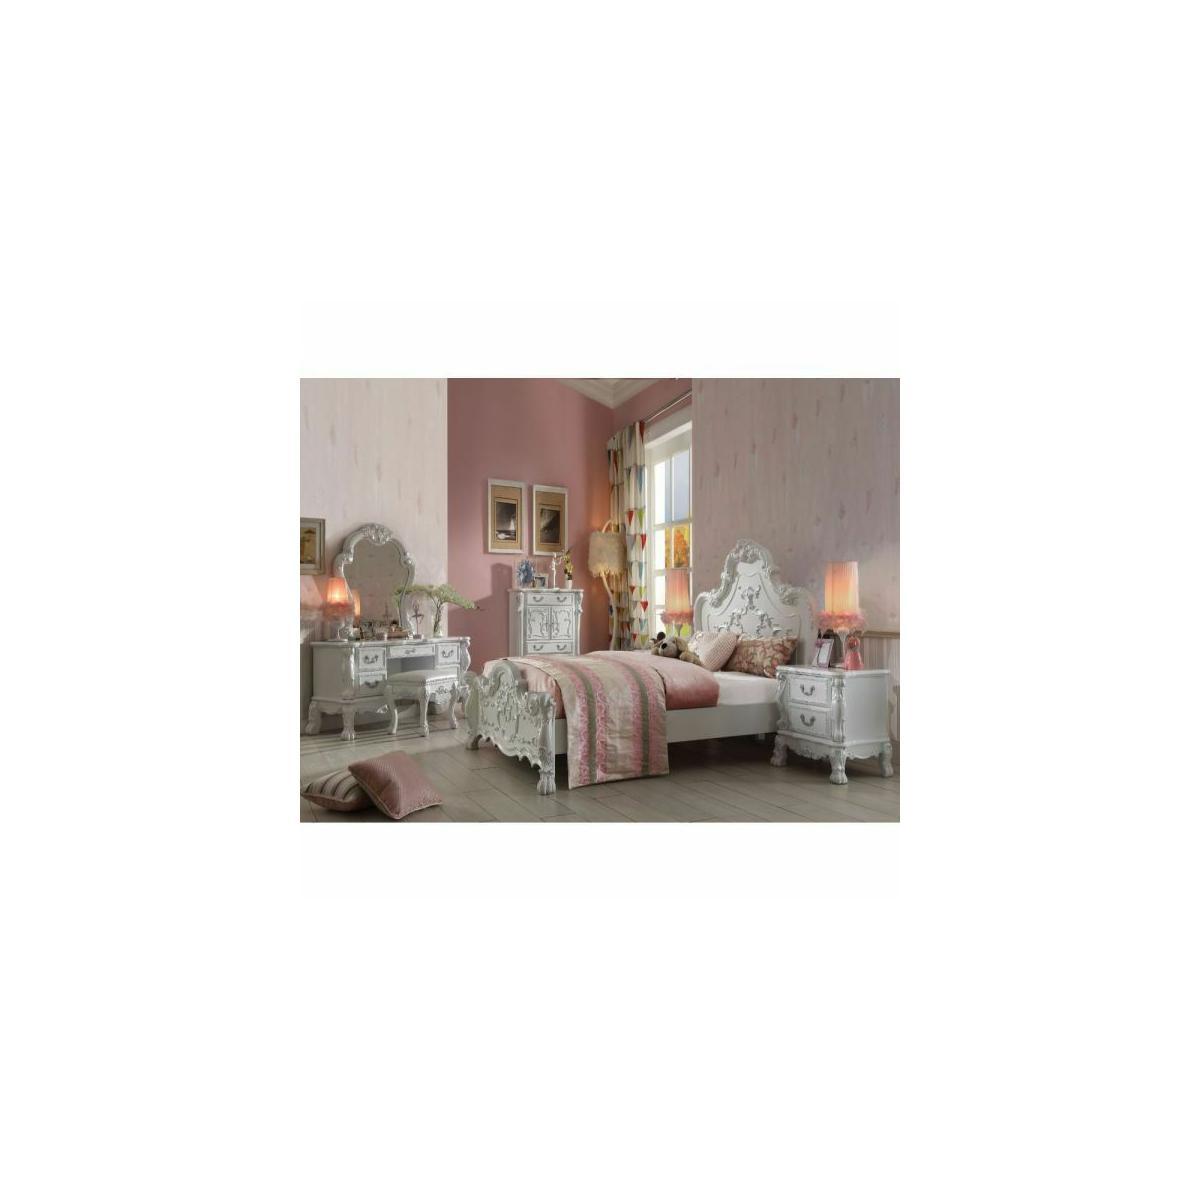 ACME Dresden Queen Bed - 30660Q - Antique White